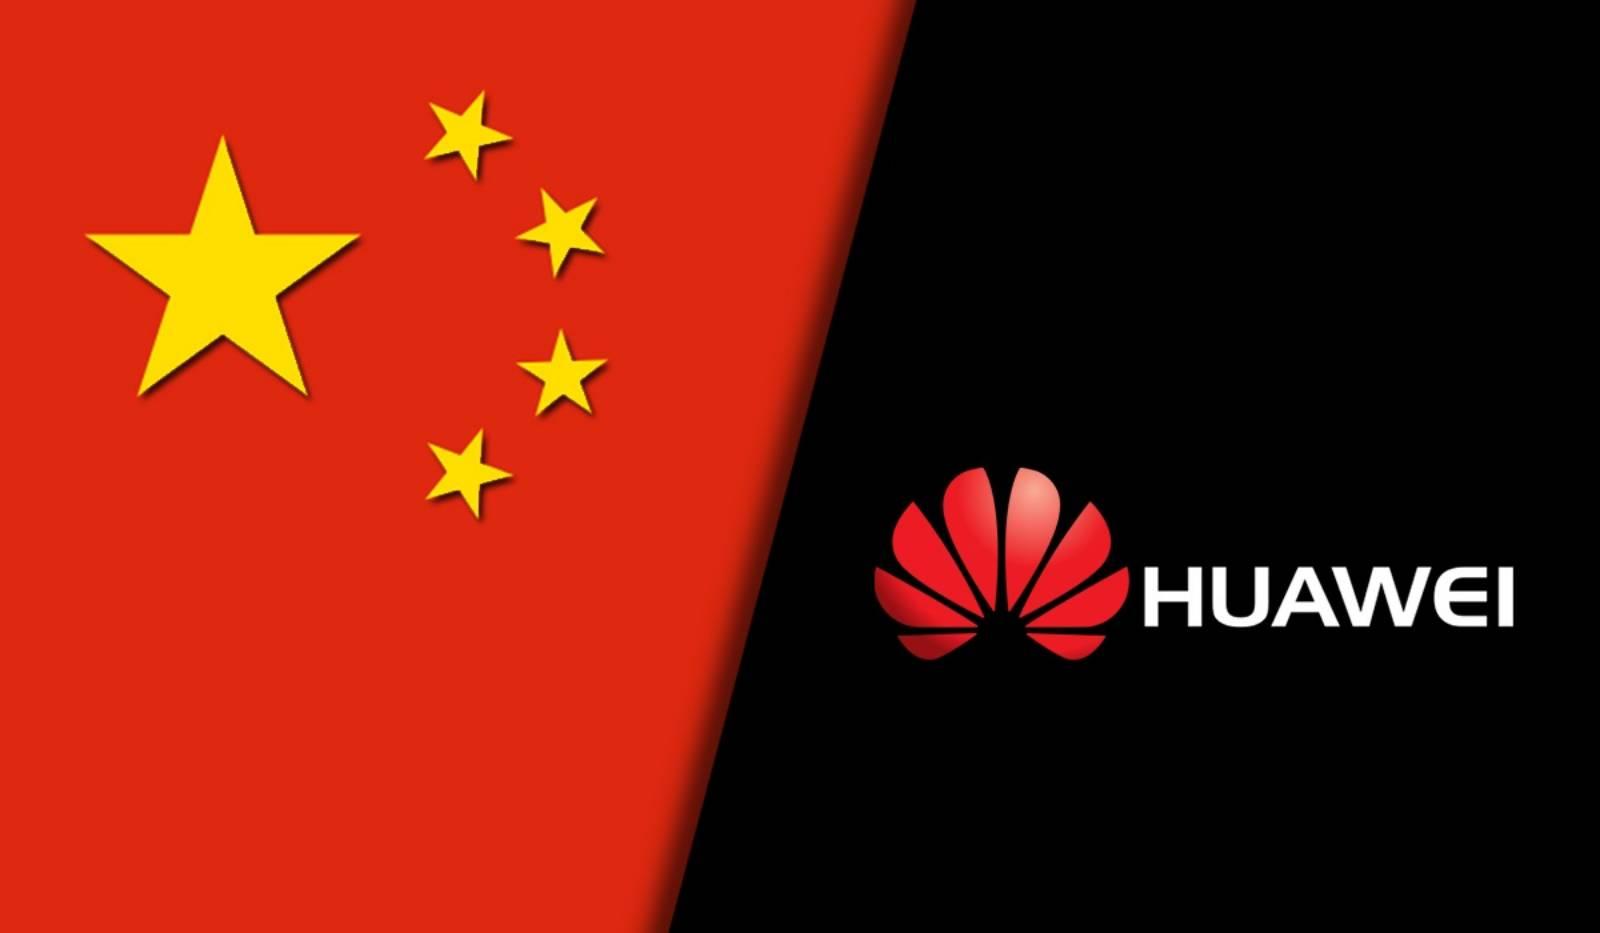 Telefoanele Huawei android